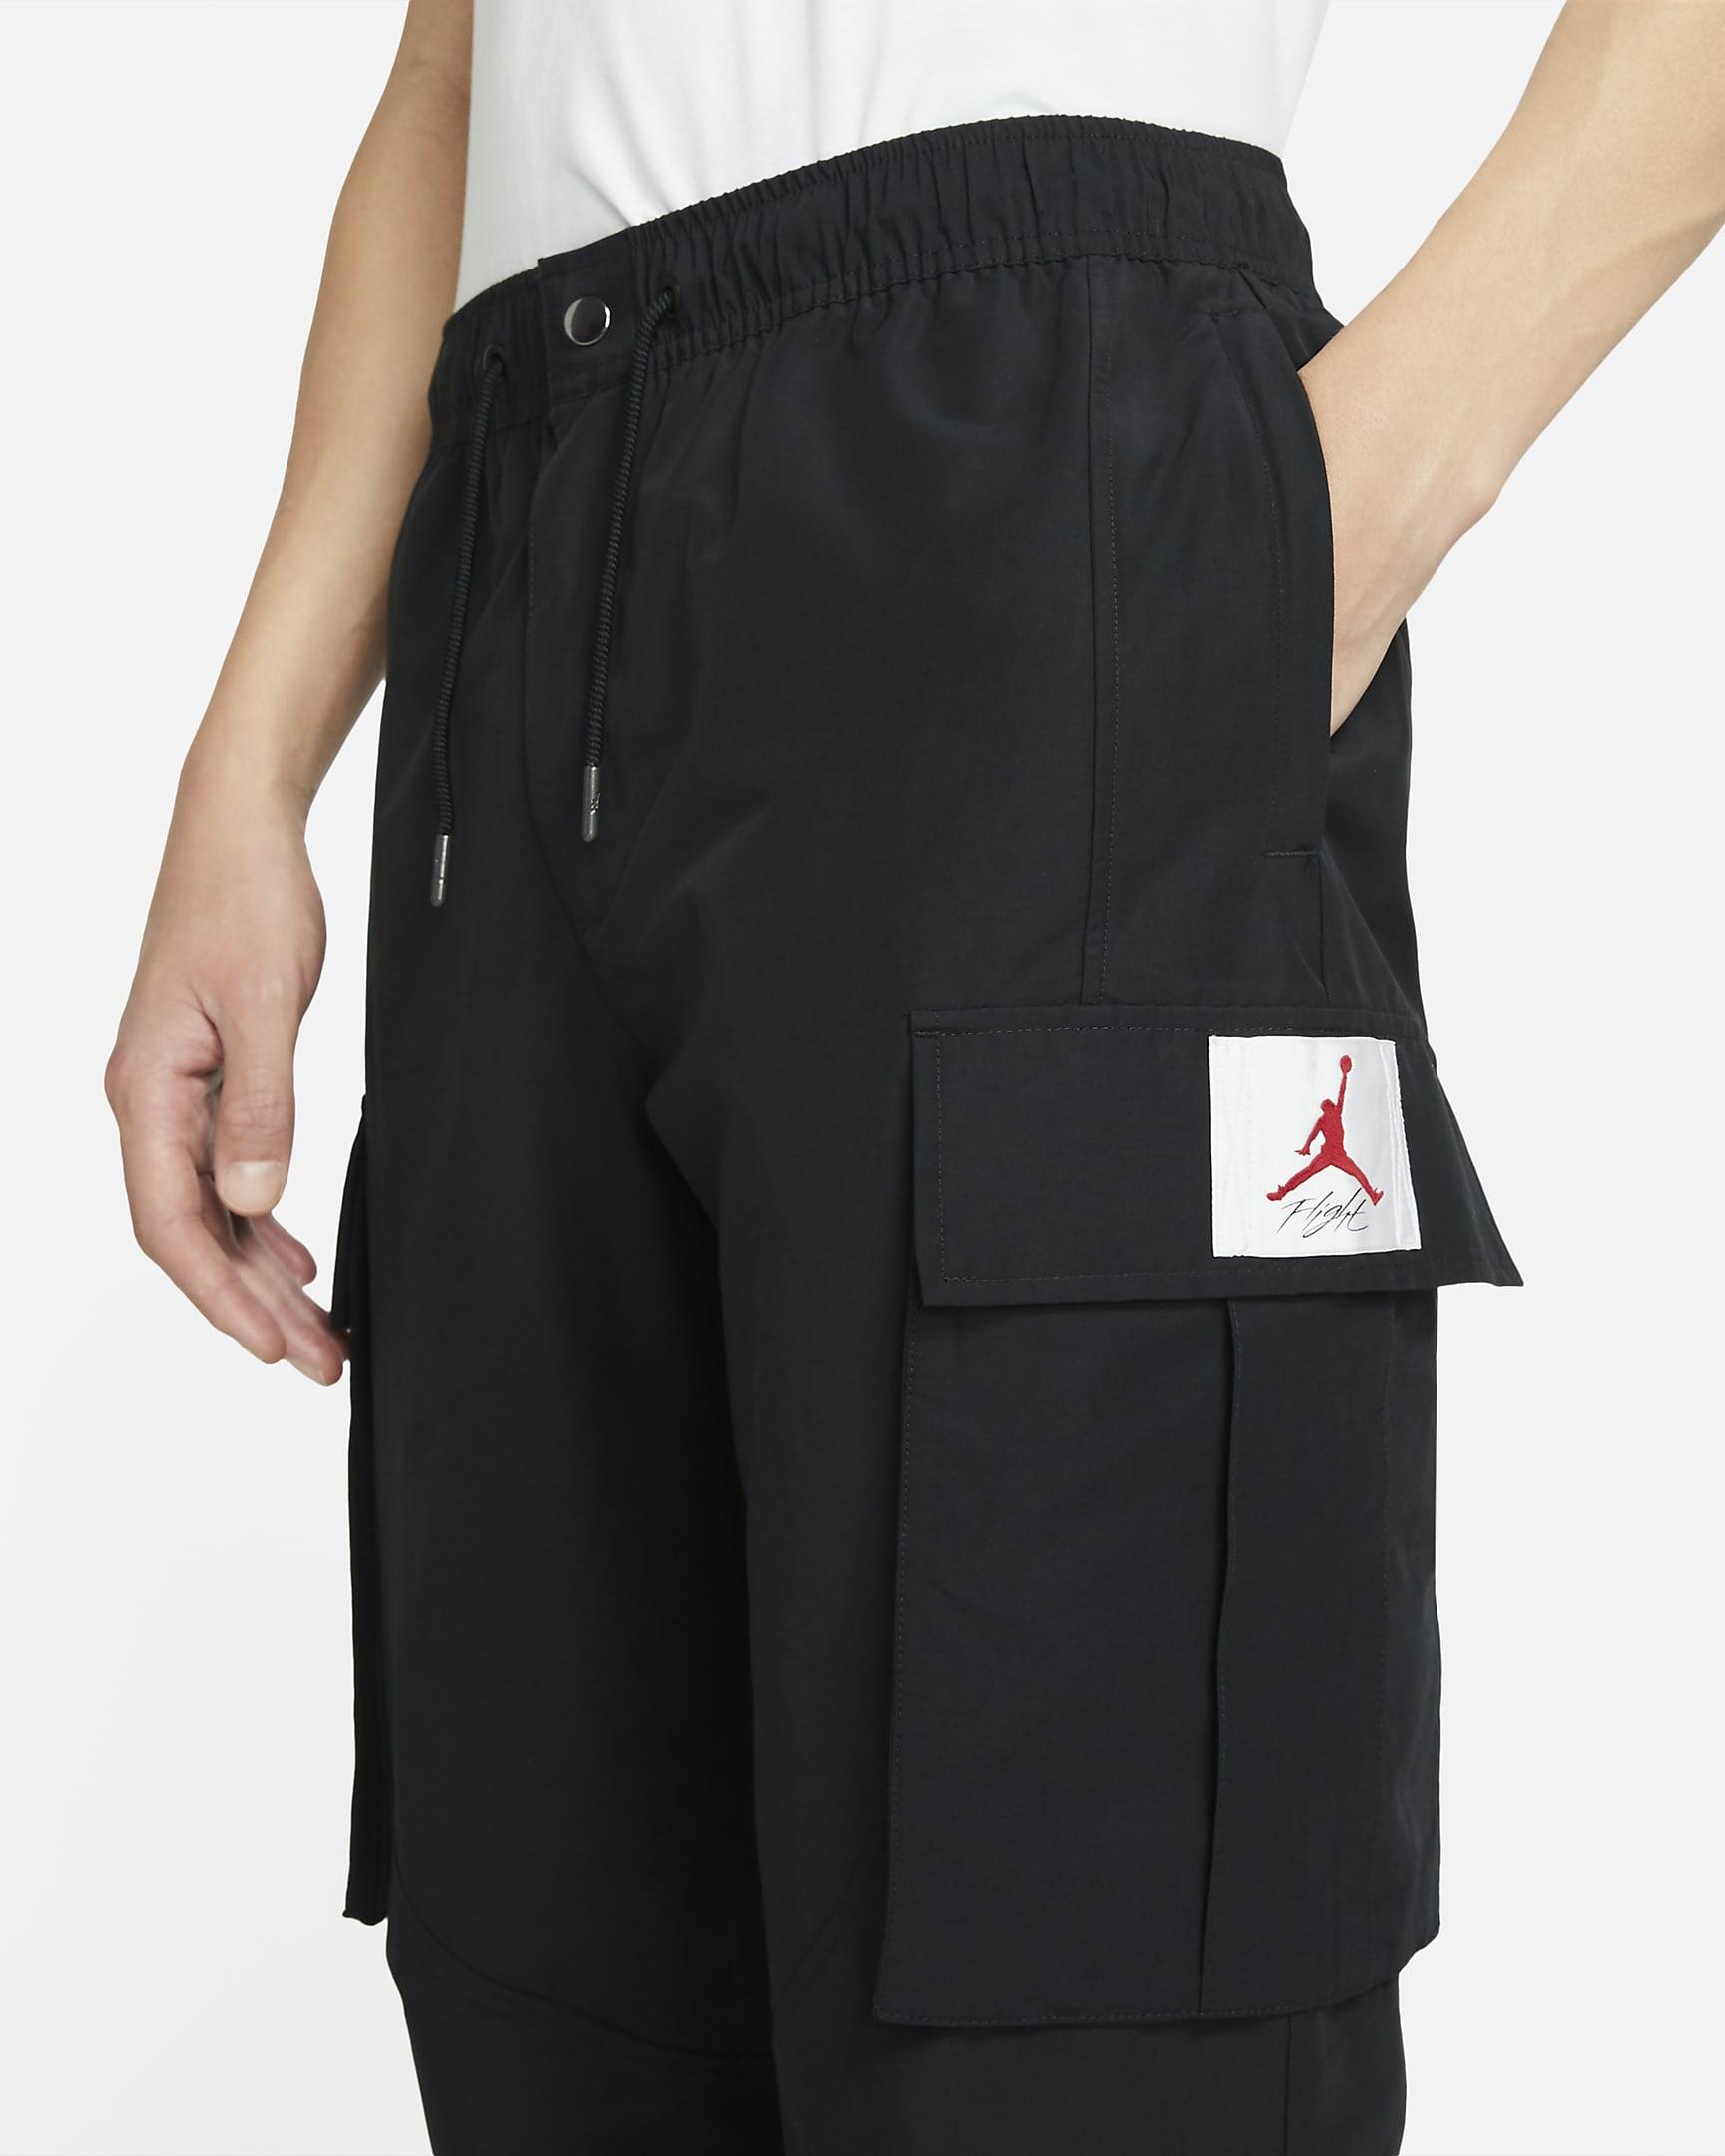 jordan-flight-mens-woven-pants-plT7Sv-3